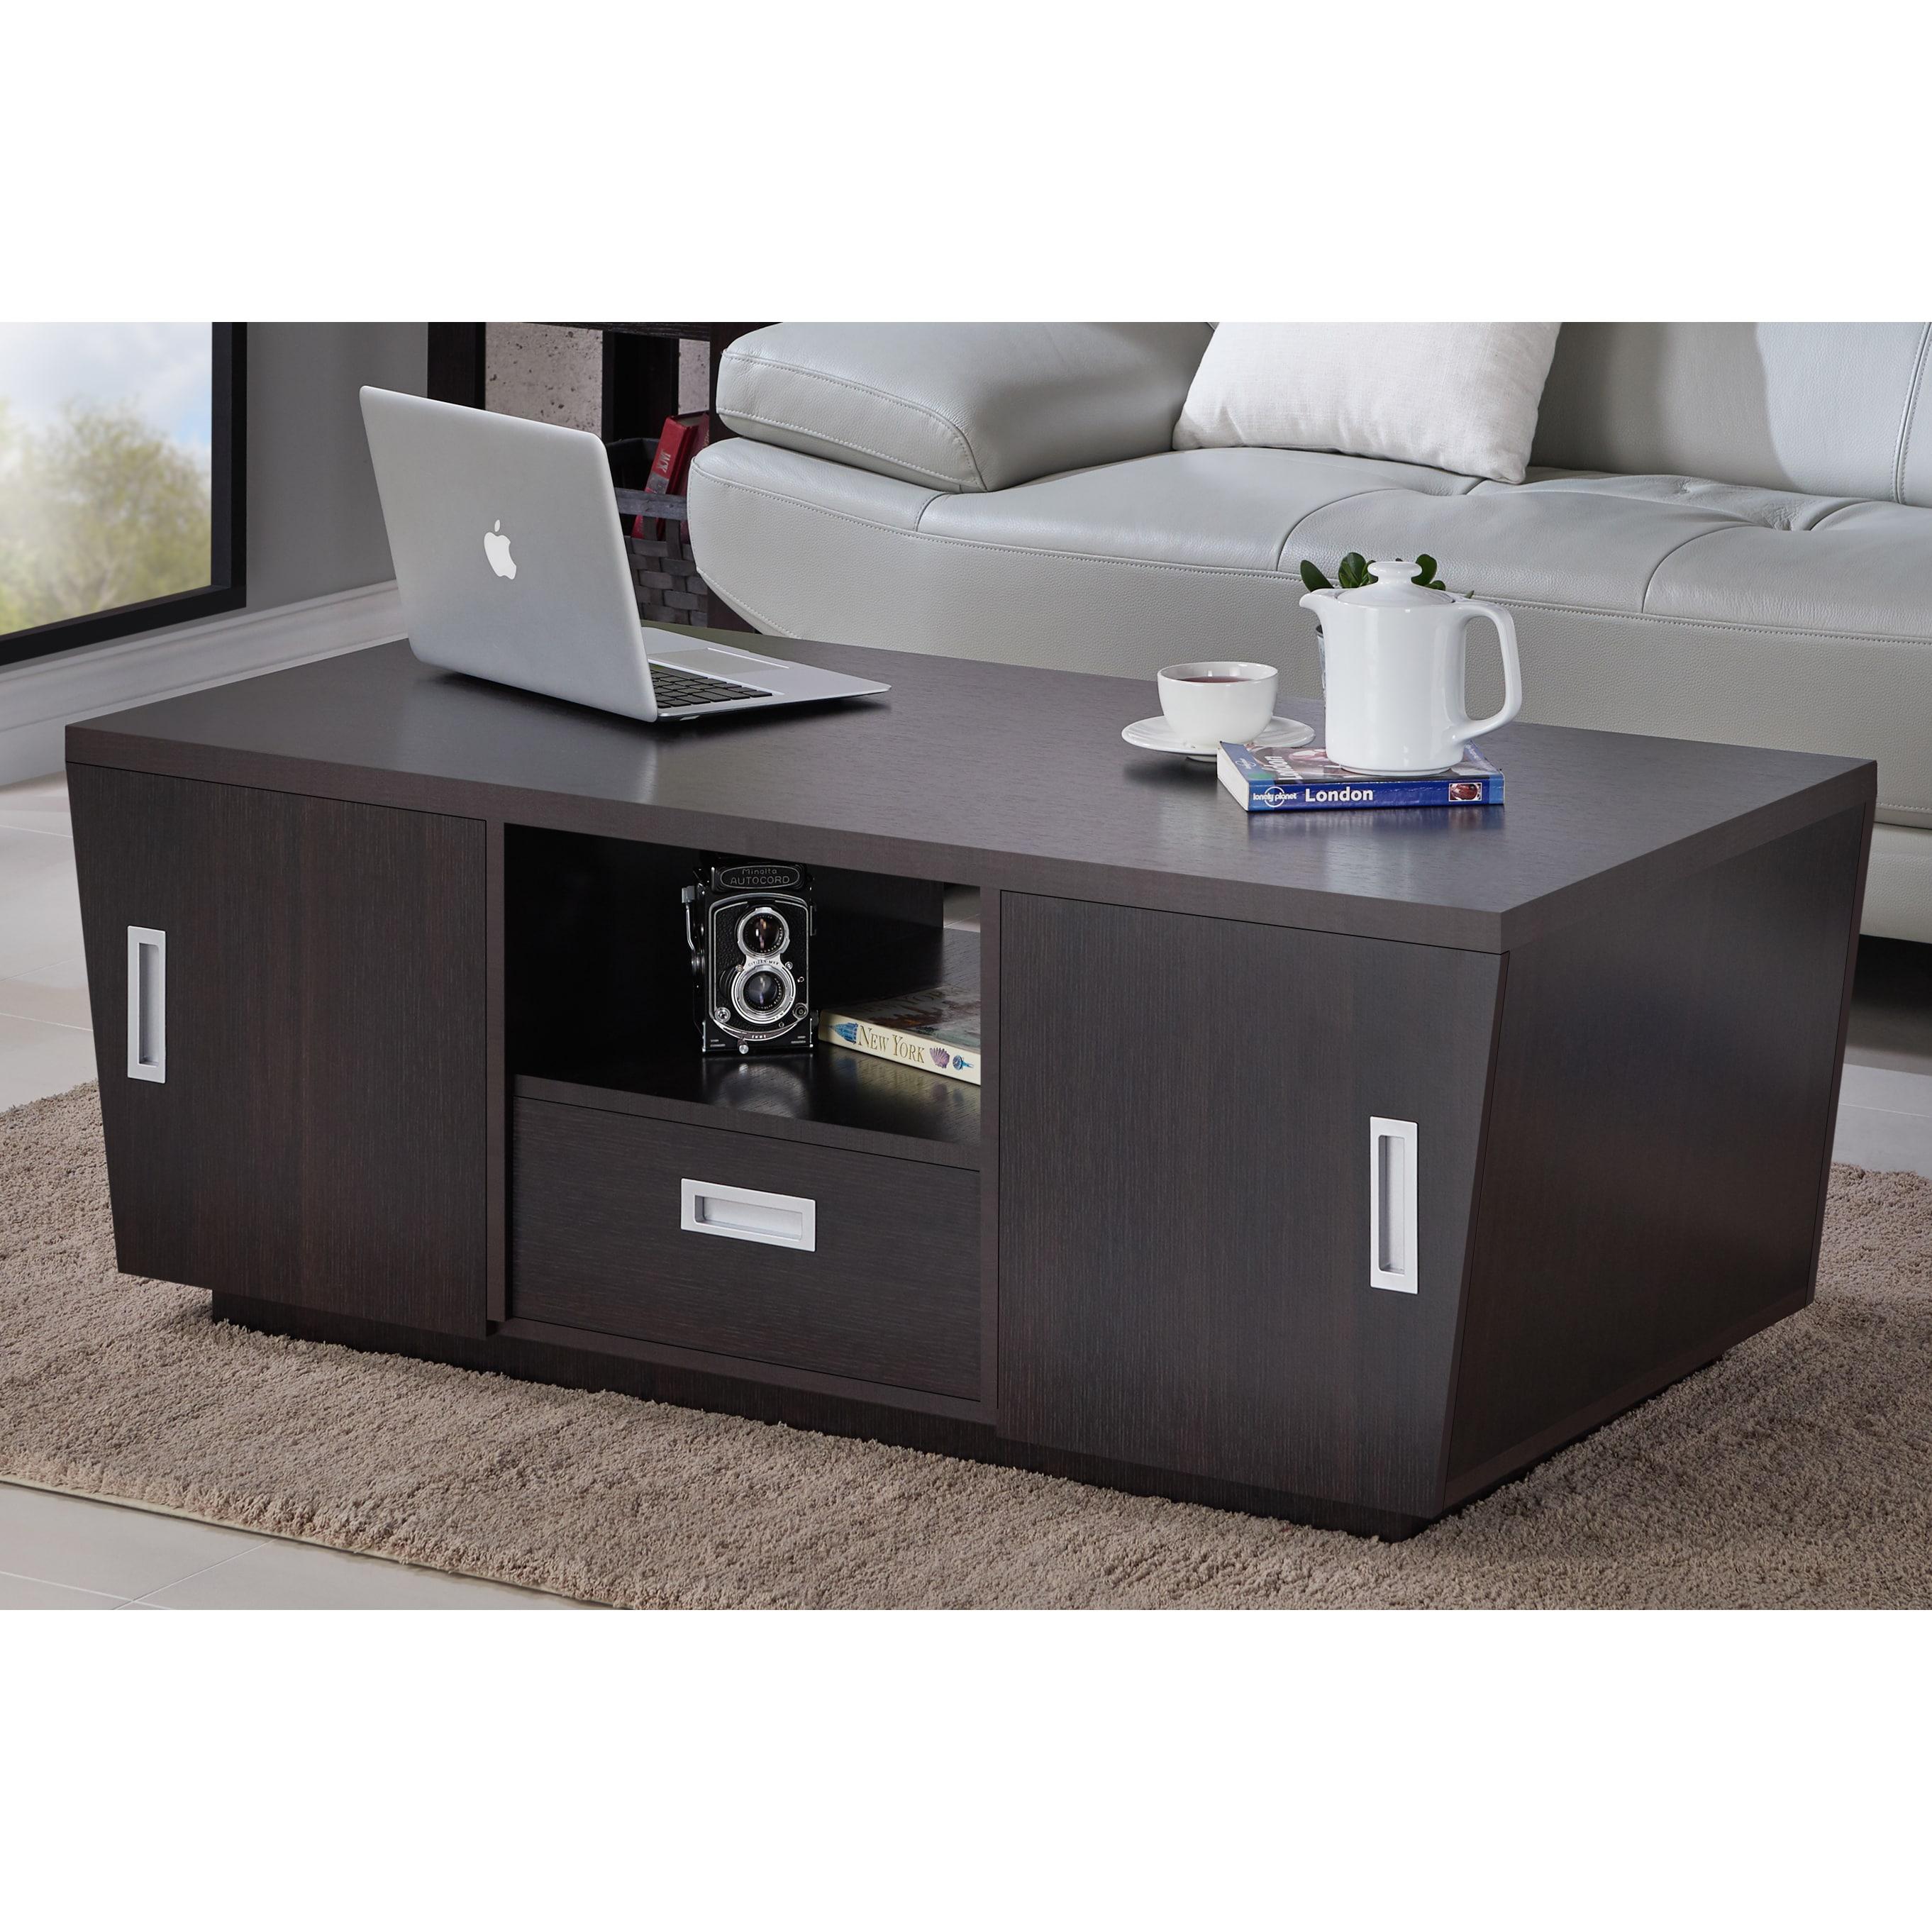 Furniture Of America Kore Modern Espresso Multi Storage Coffee Table